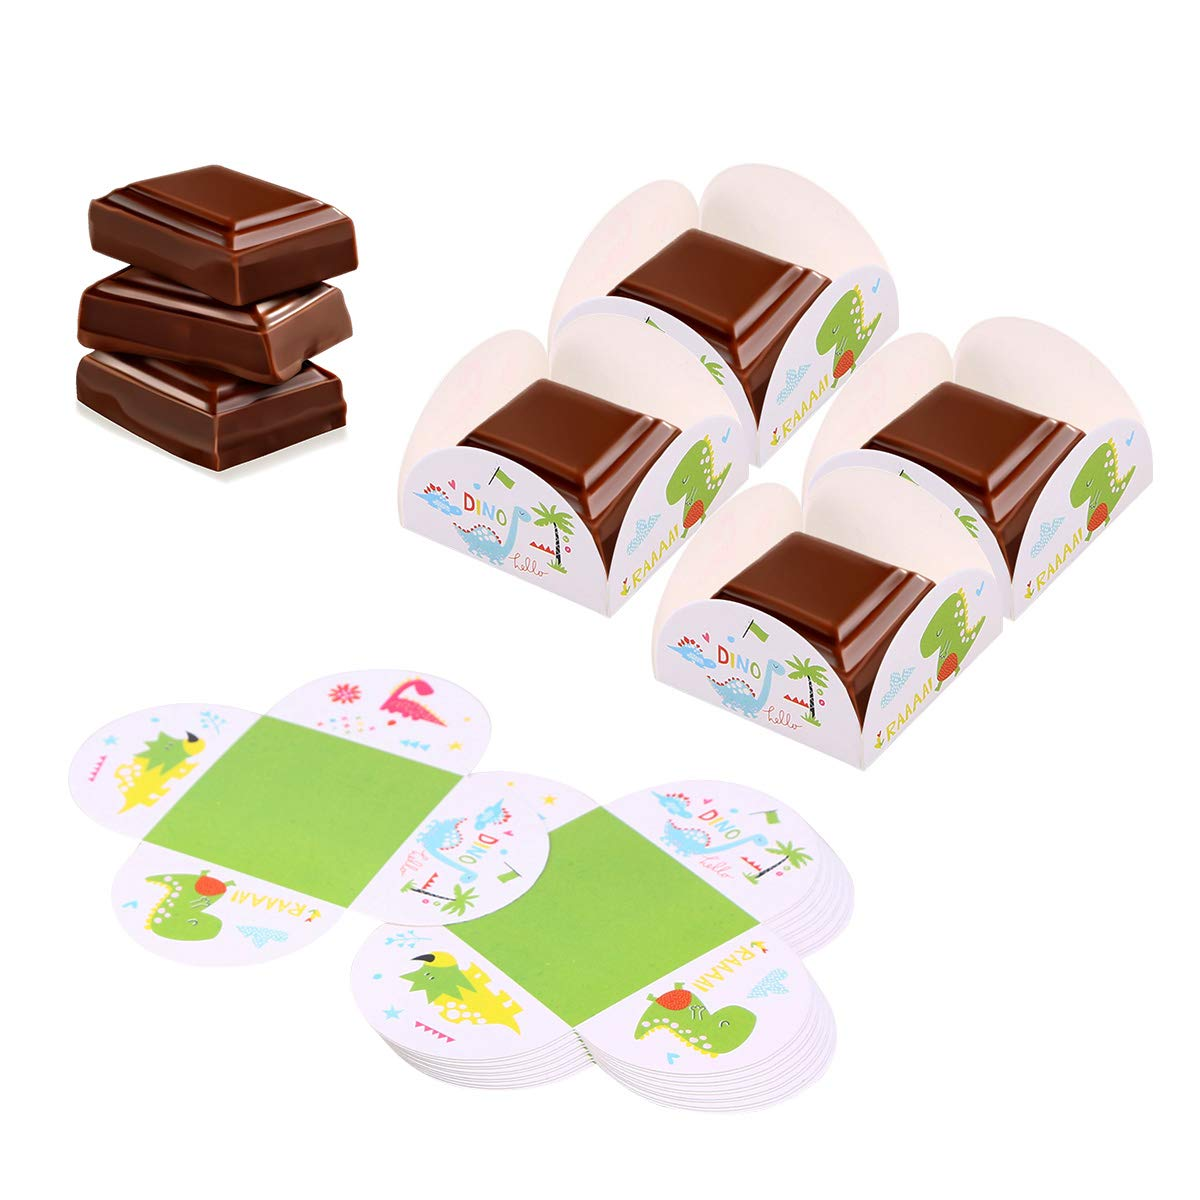 BESTONZON 10 St/ücke Schokoladenpapier Tablett Dinosaurier Gemustert Einweg Cupcake Cookies Box Container Party Supplies